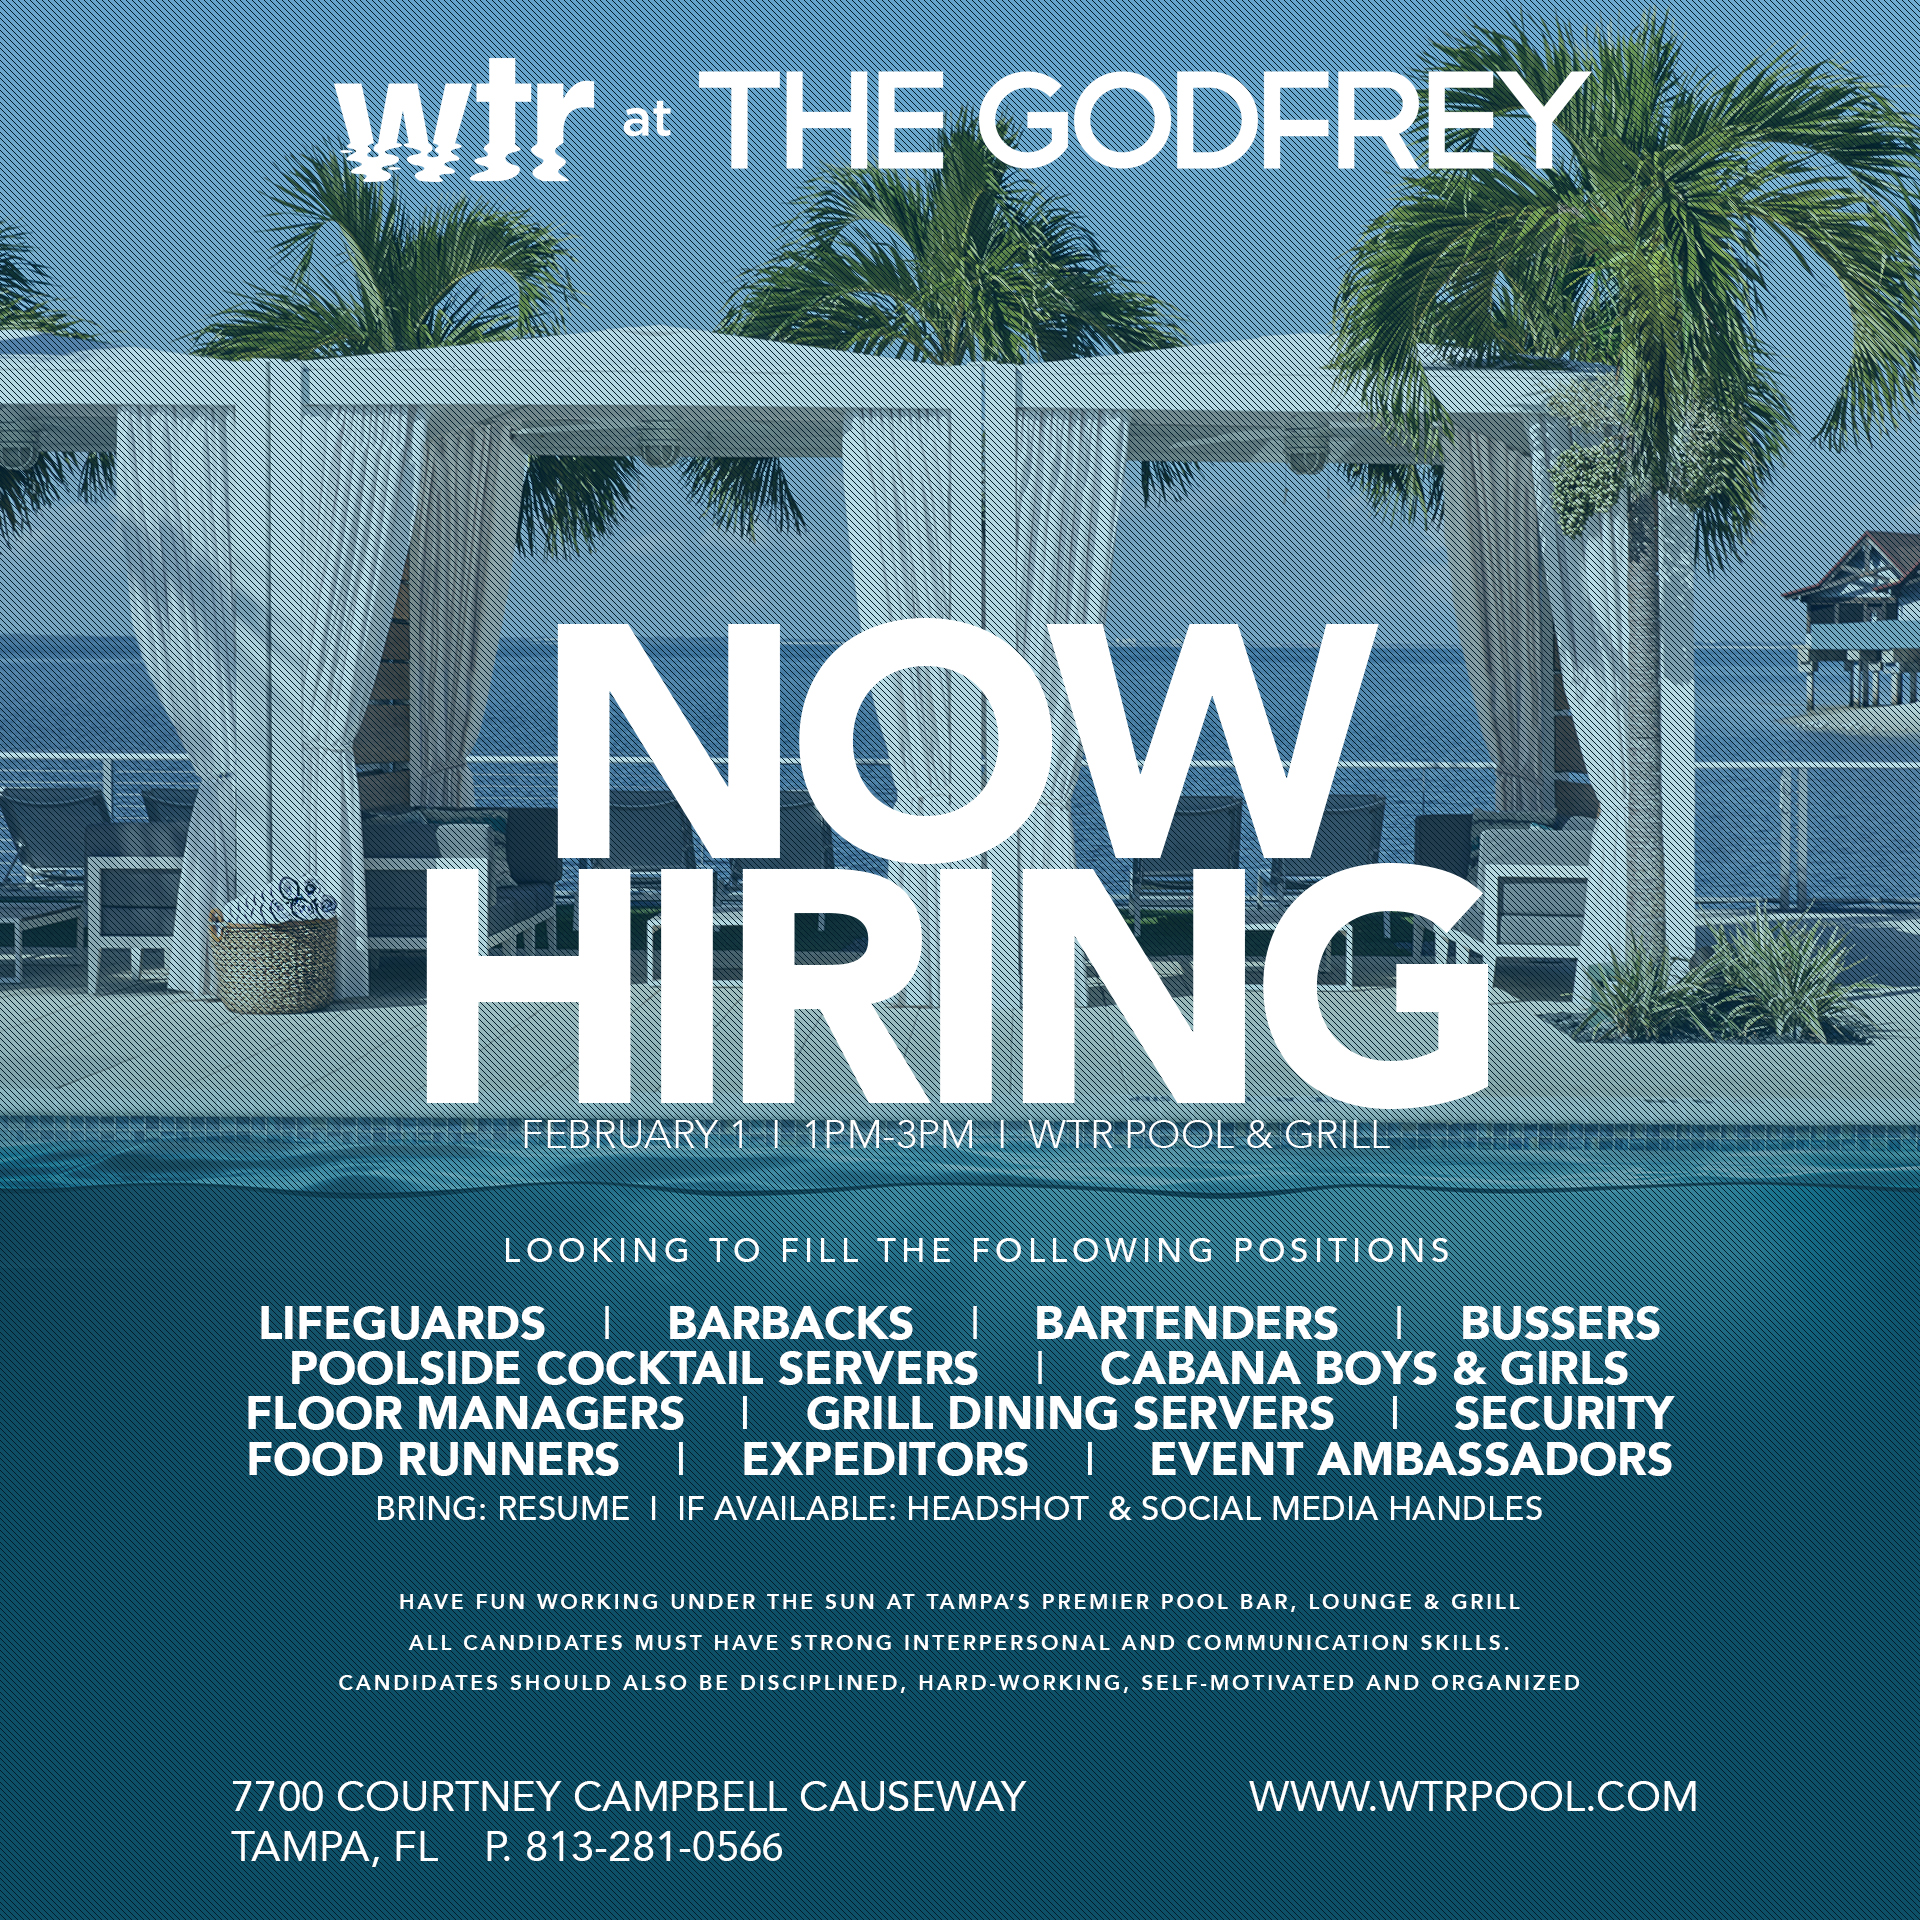 wtr tampa hiring job positions godfrey hotel tampa bay